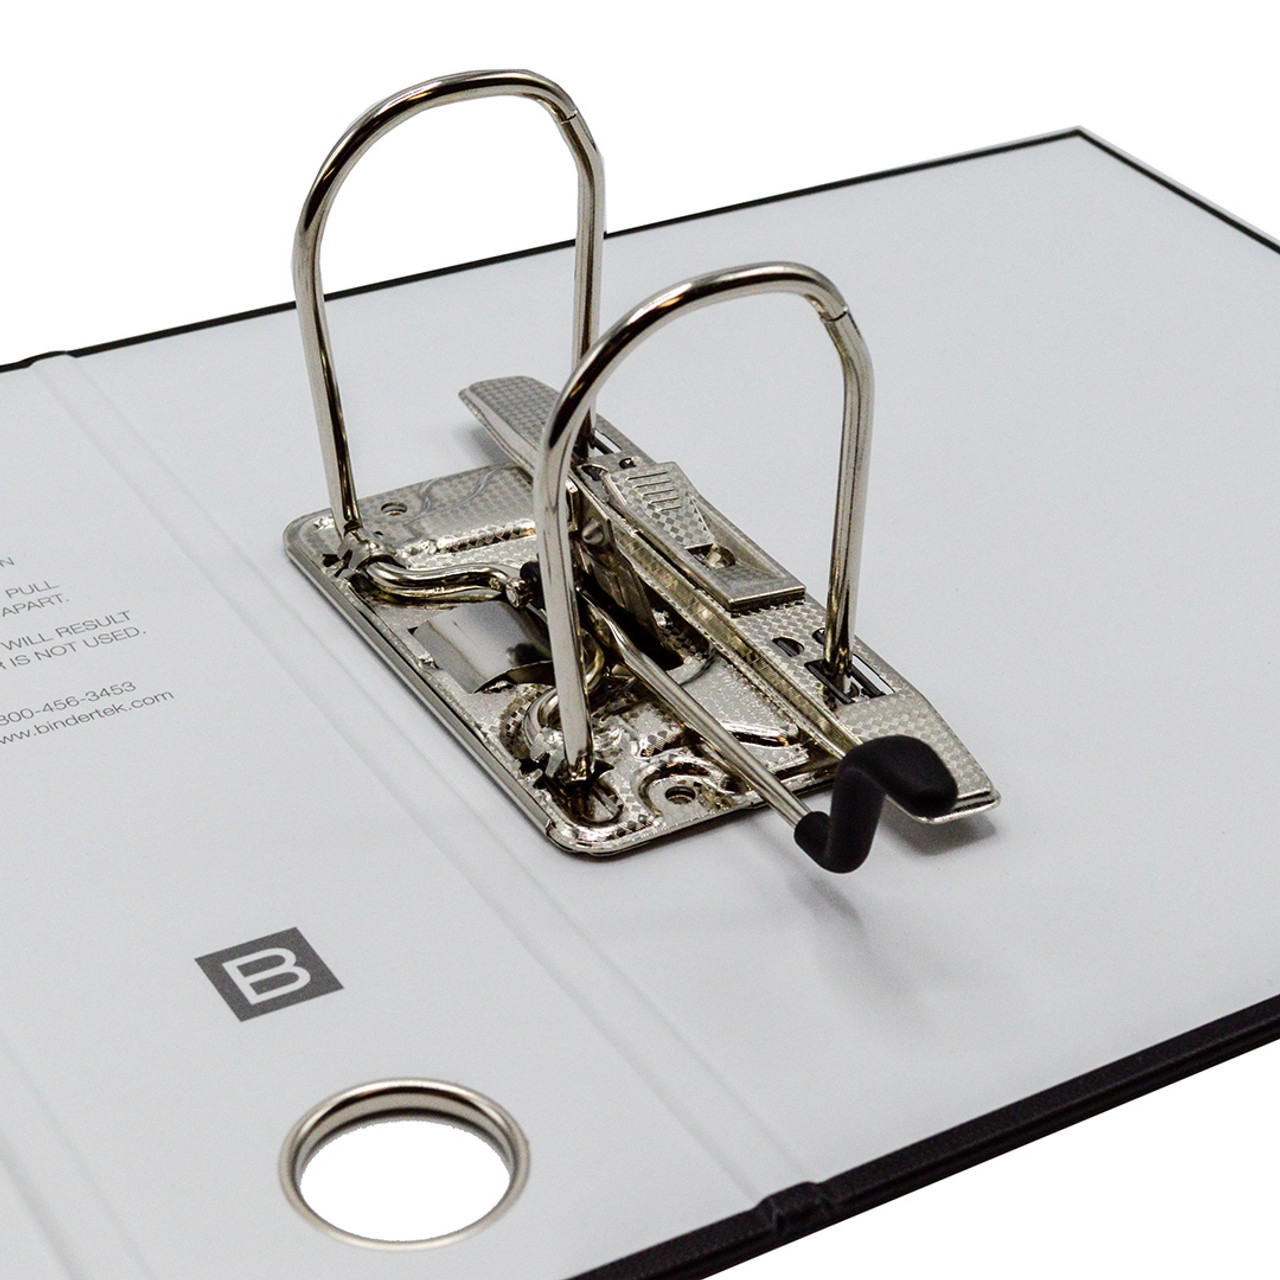 Advantage Mini 2-Ring Binder For Half Letter-Size Paper, 3